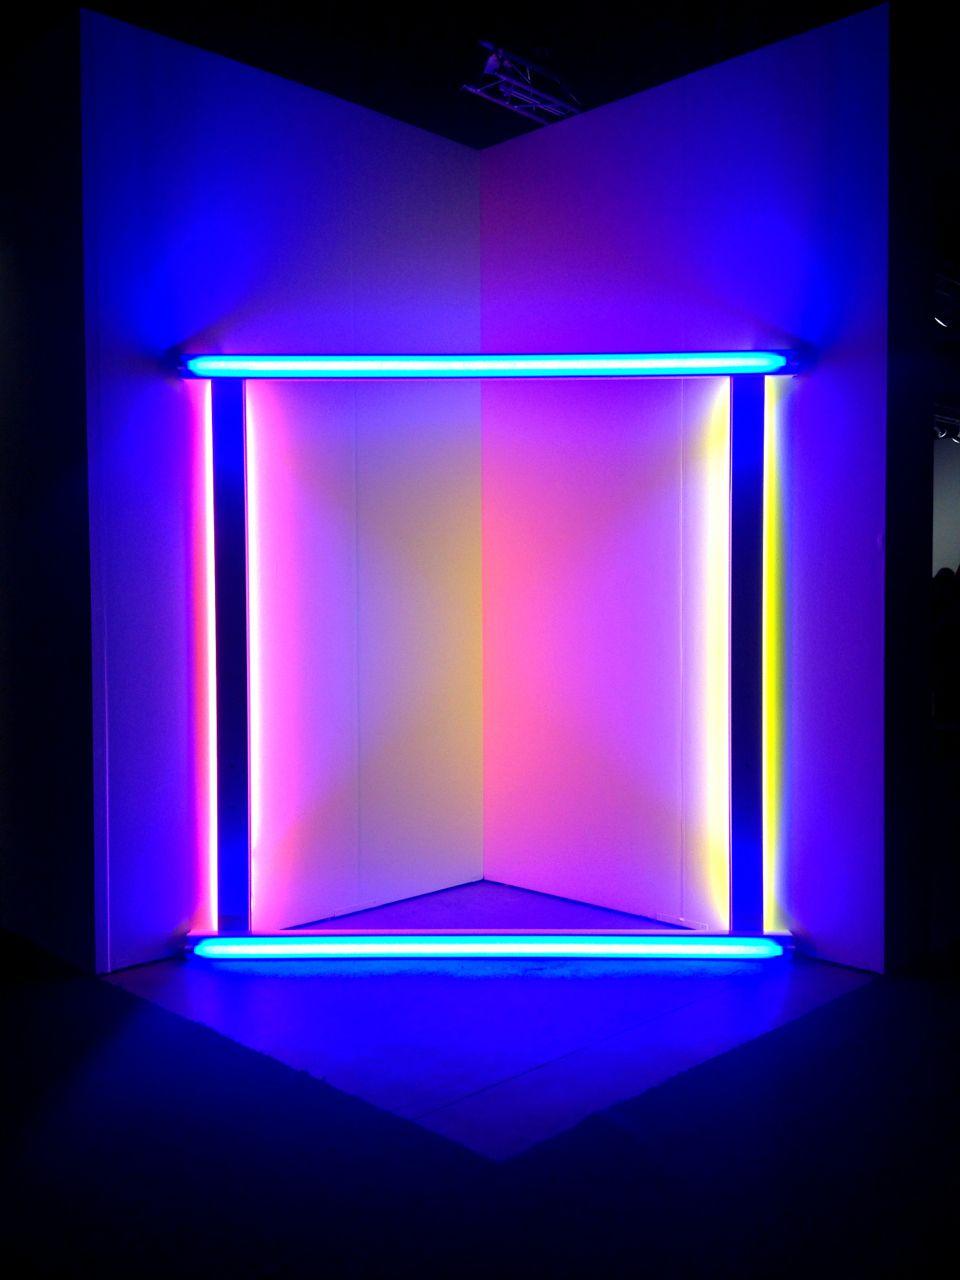 flavin dan light neon lights installation artist fluorescent visit architecture aesthetic tubes fondos